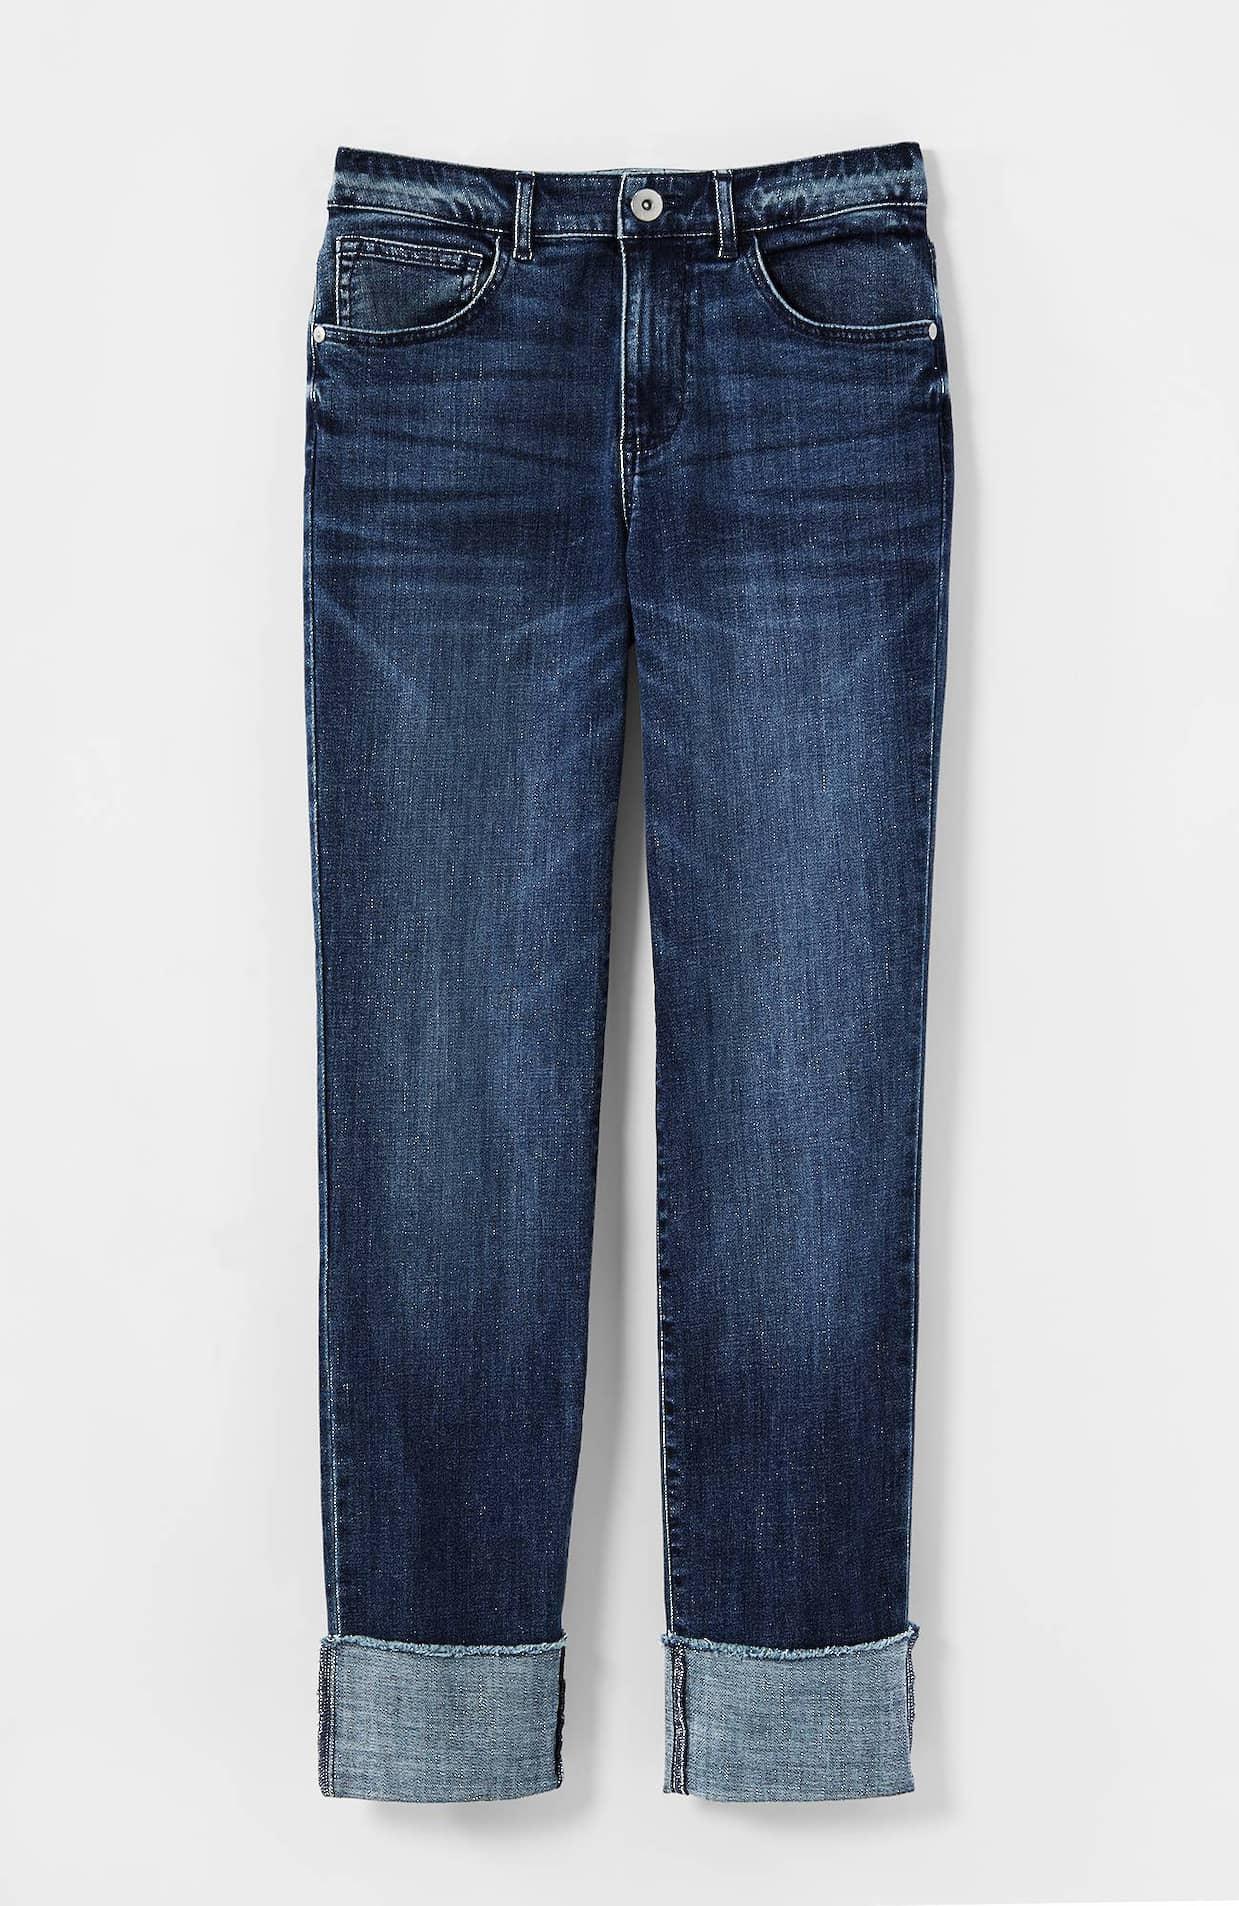 High Rise Cuffed Jeans   JJill